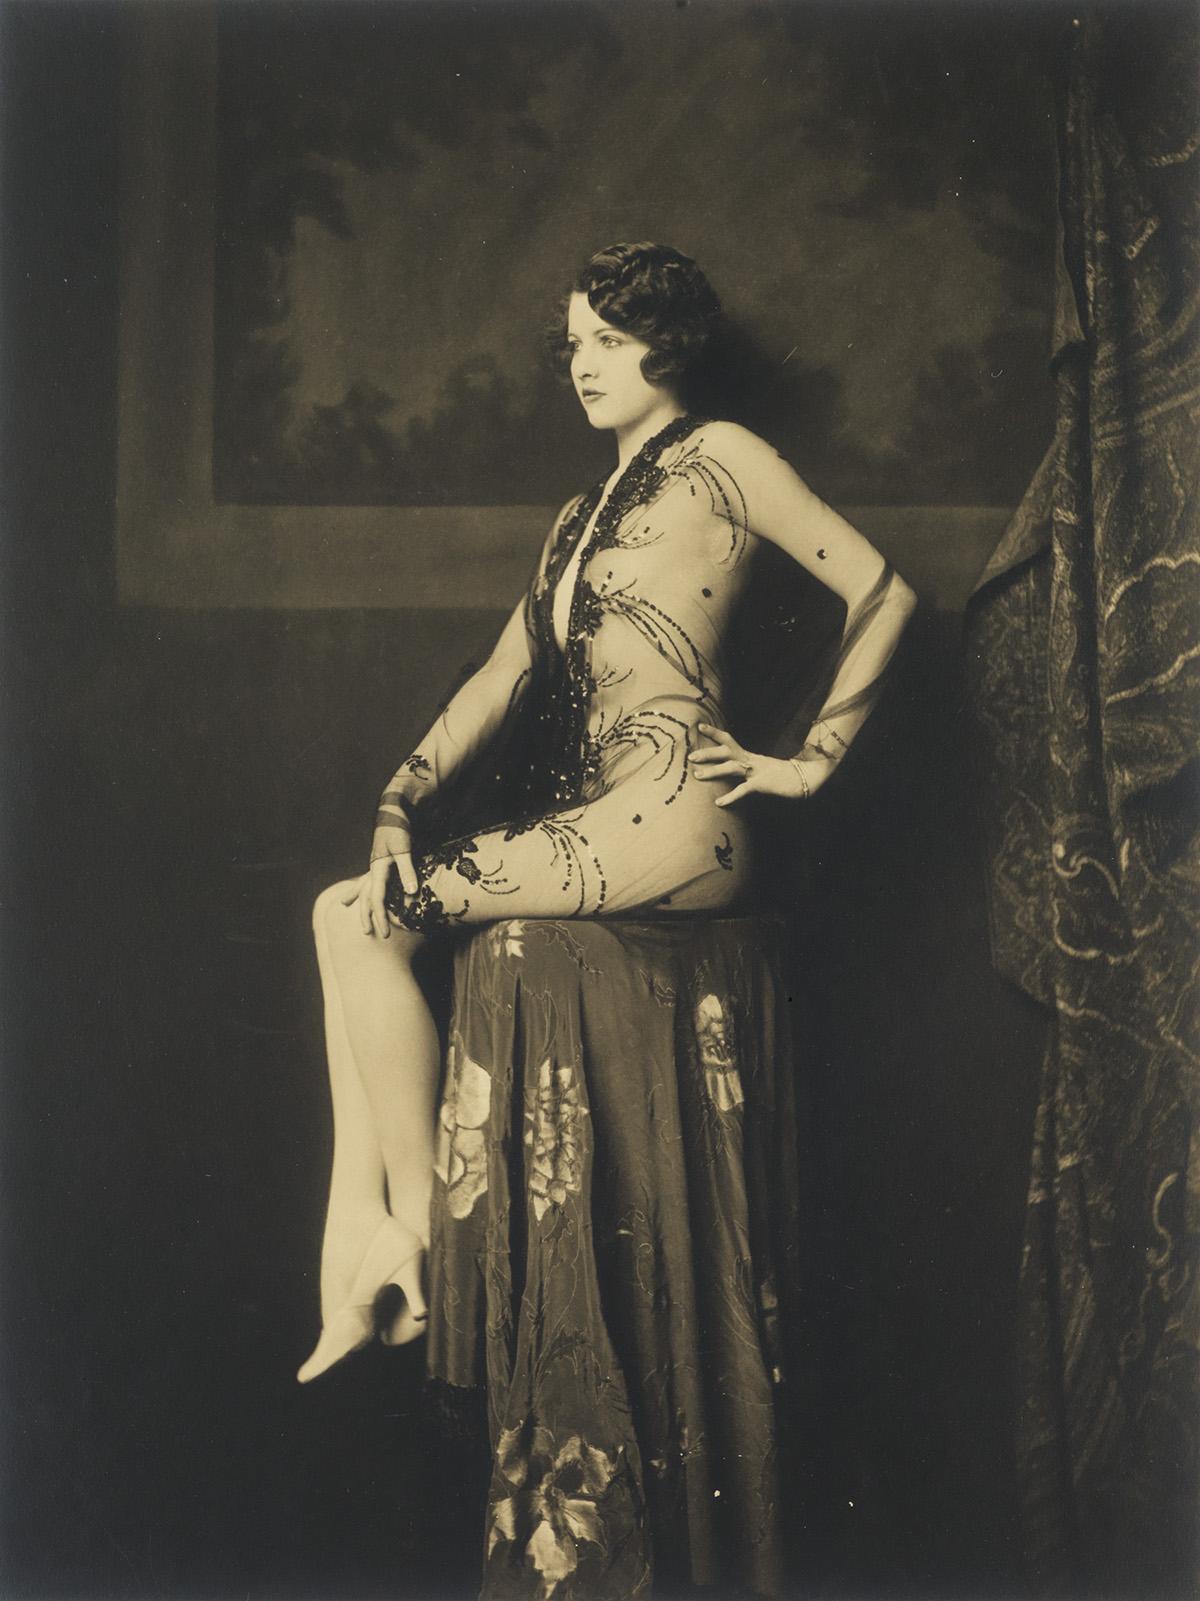 ALFRED-CHENEY-JOHNSTON-(1885-1971)-Jean-Akerman-Ziegfeld-girl